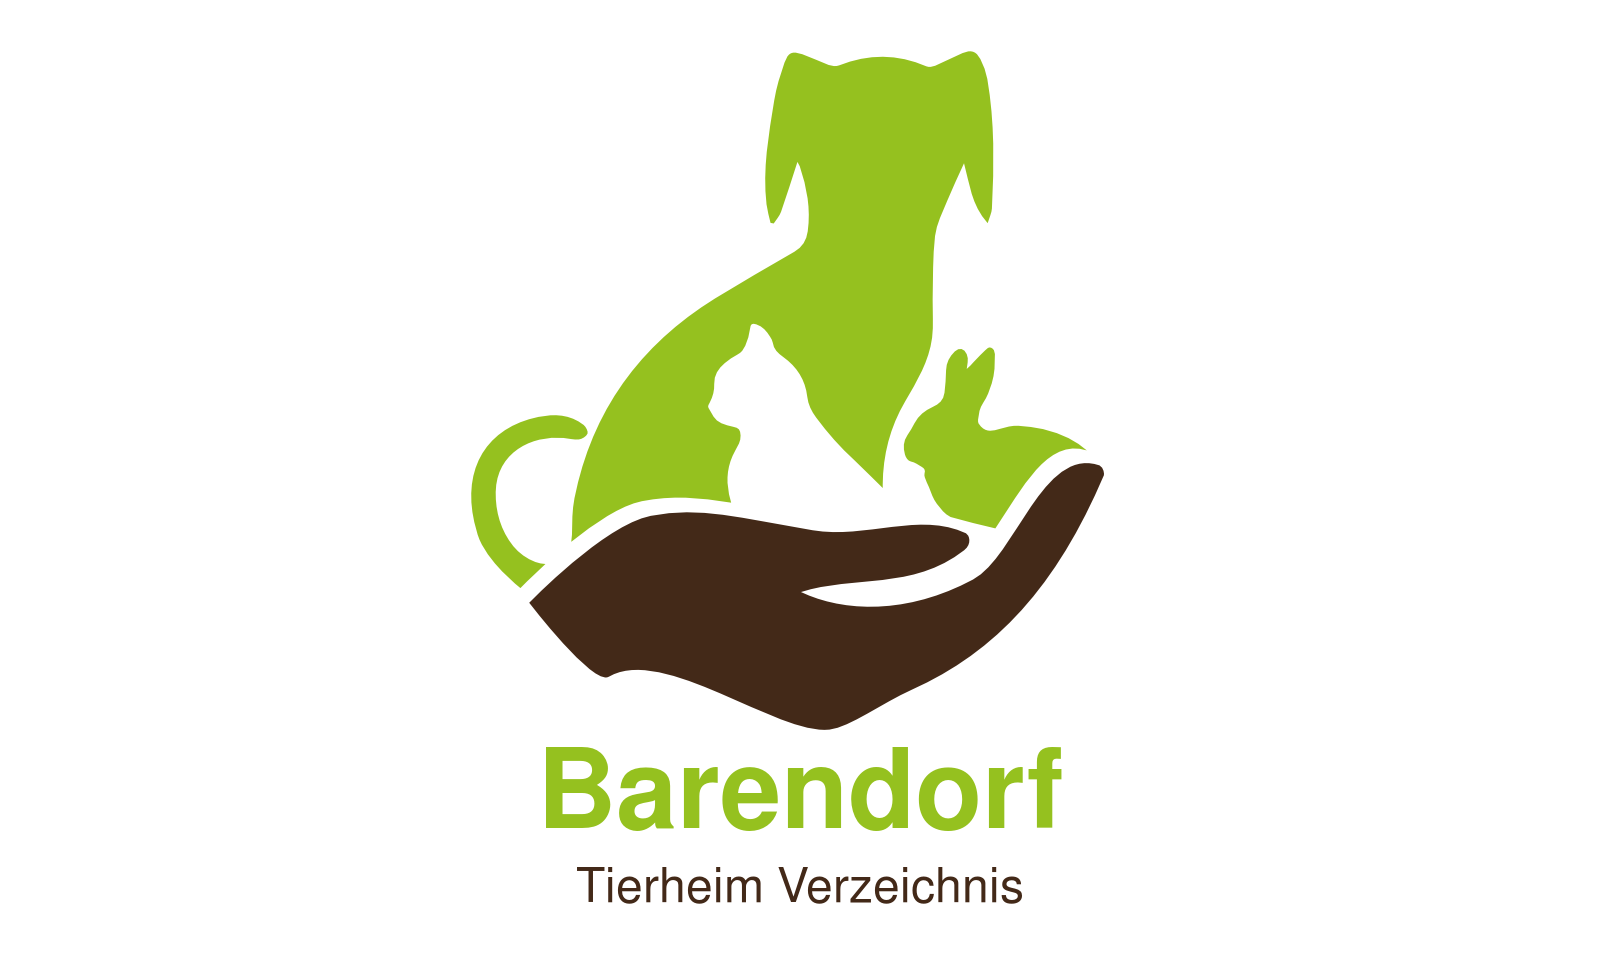 Tierheim Barendorf